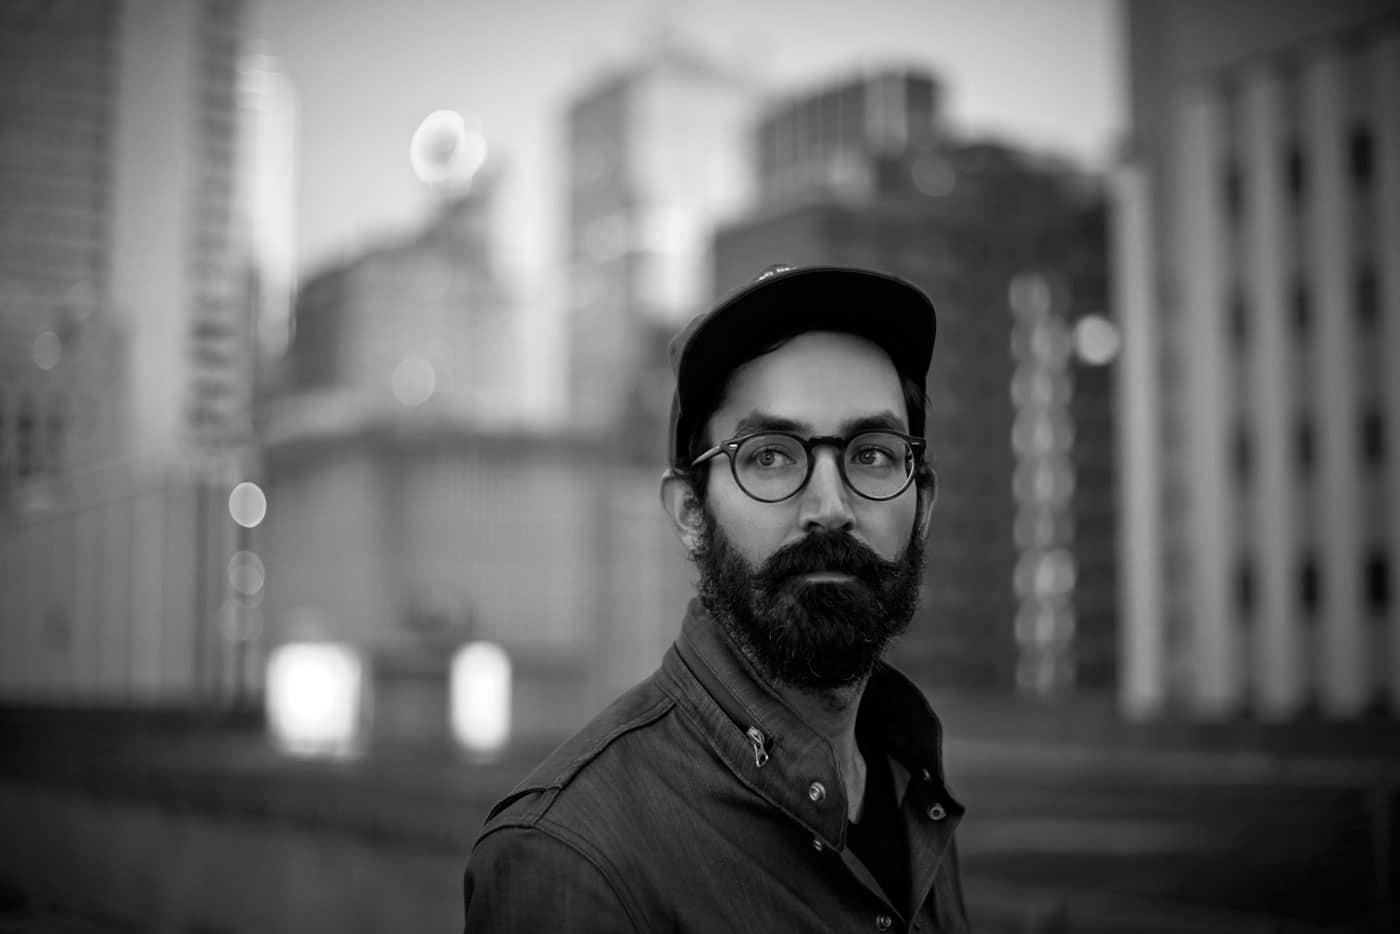 Droplr and Designer: Kyle Steed